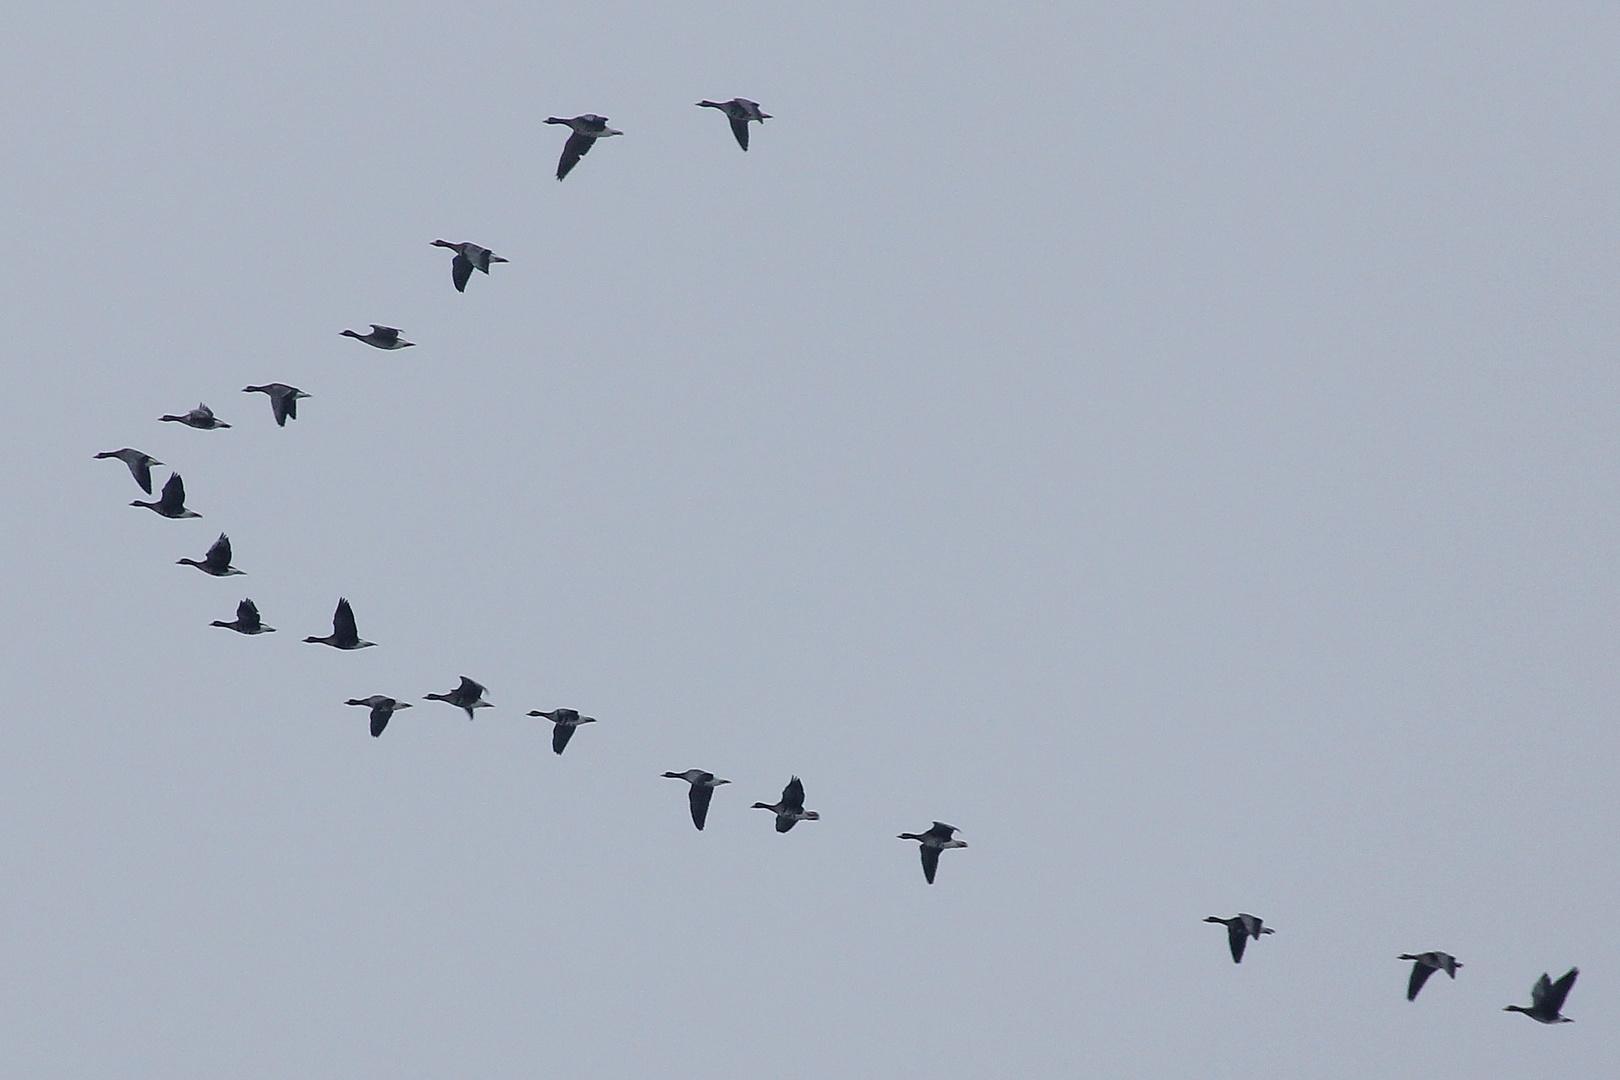 super popular d2e8f dbf10 Formationsflug Foto & Bild | tiere, wildlife, wild lebende ...